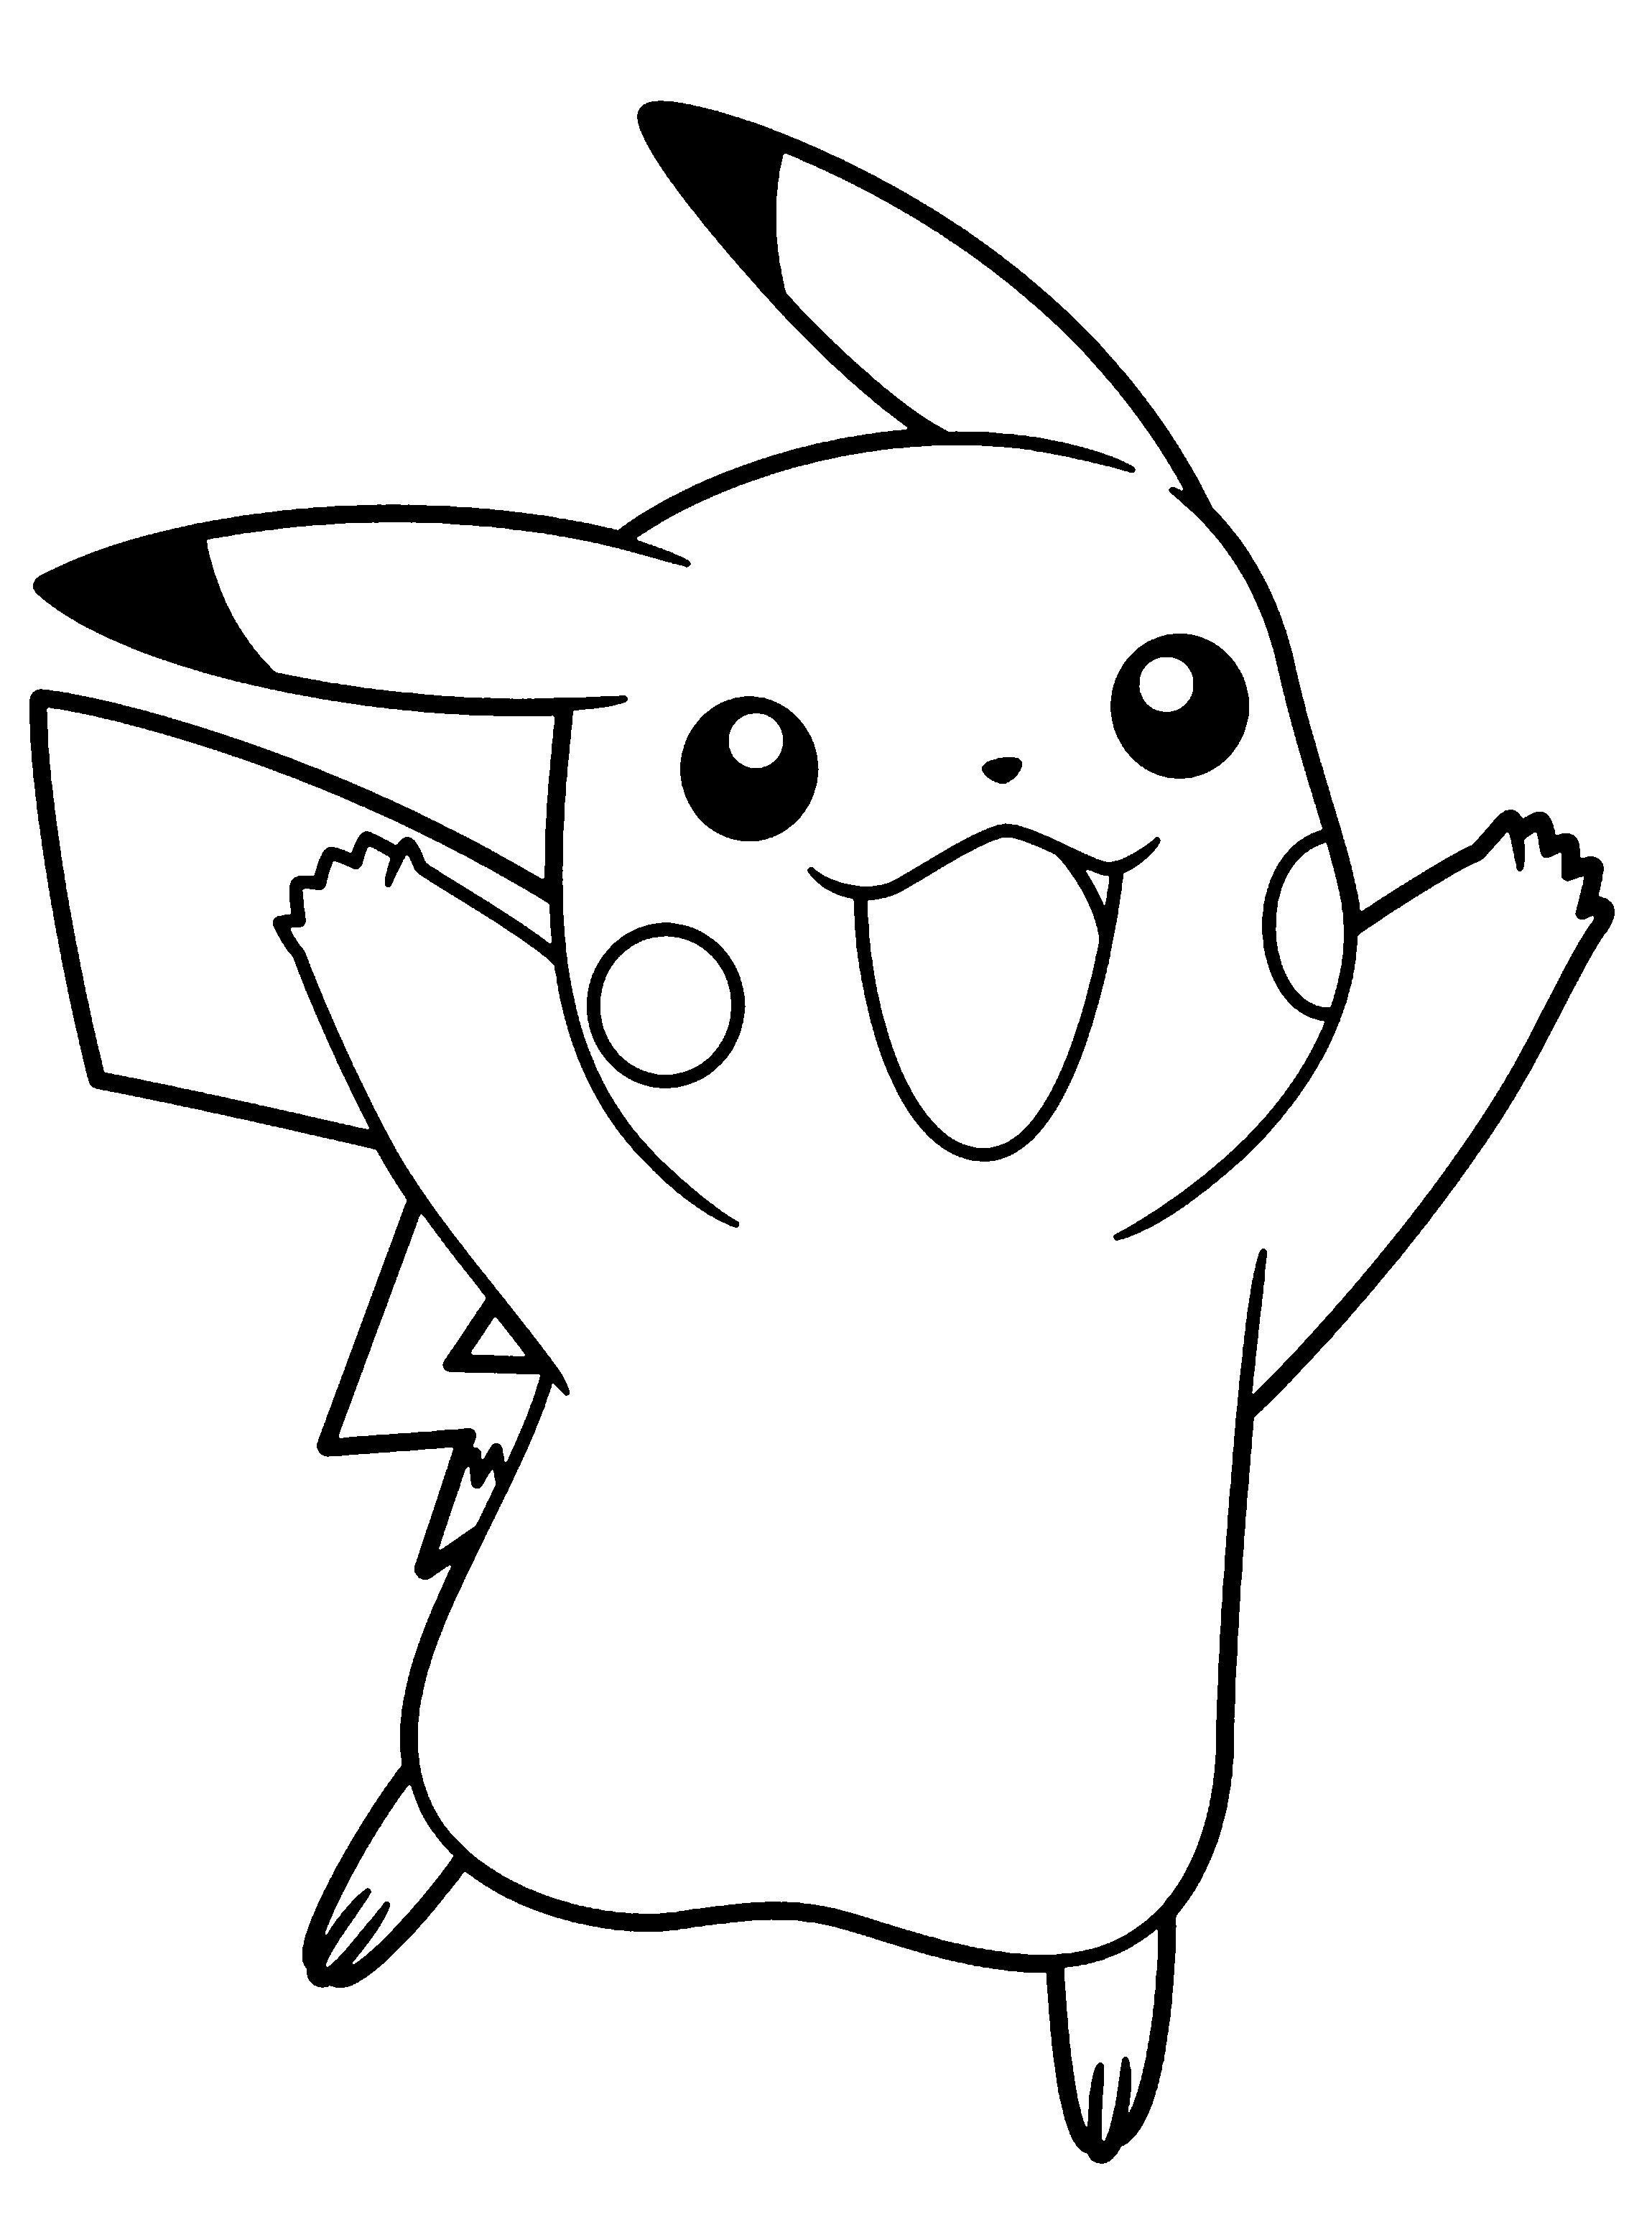 Pikachu Coloring In Coloring Pages Allow Kids To Accompany Their Favorite Characters On An Adventure Cartoon Tekeningen Digitale Stempels Meiden Tekeningen